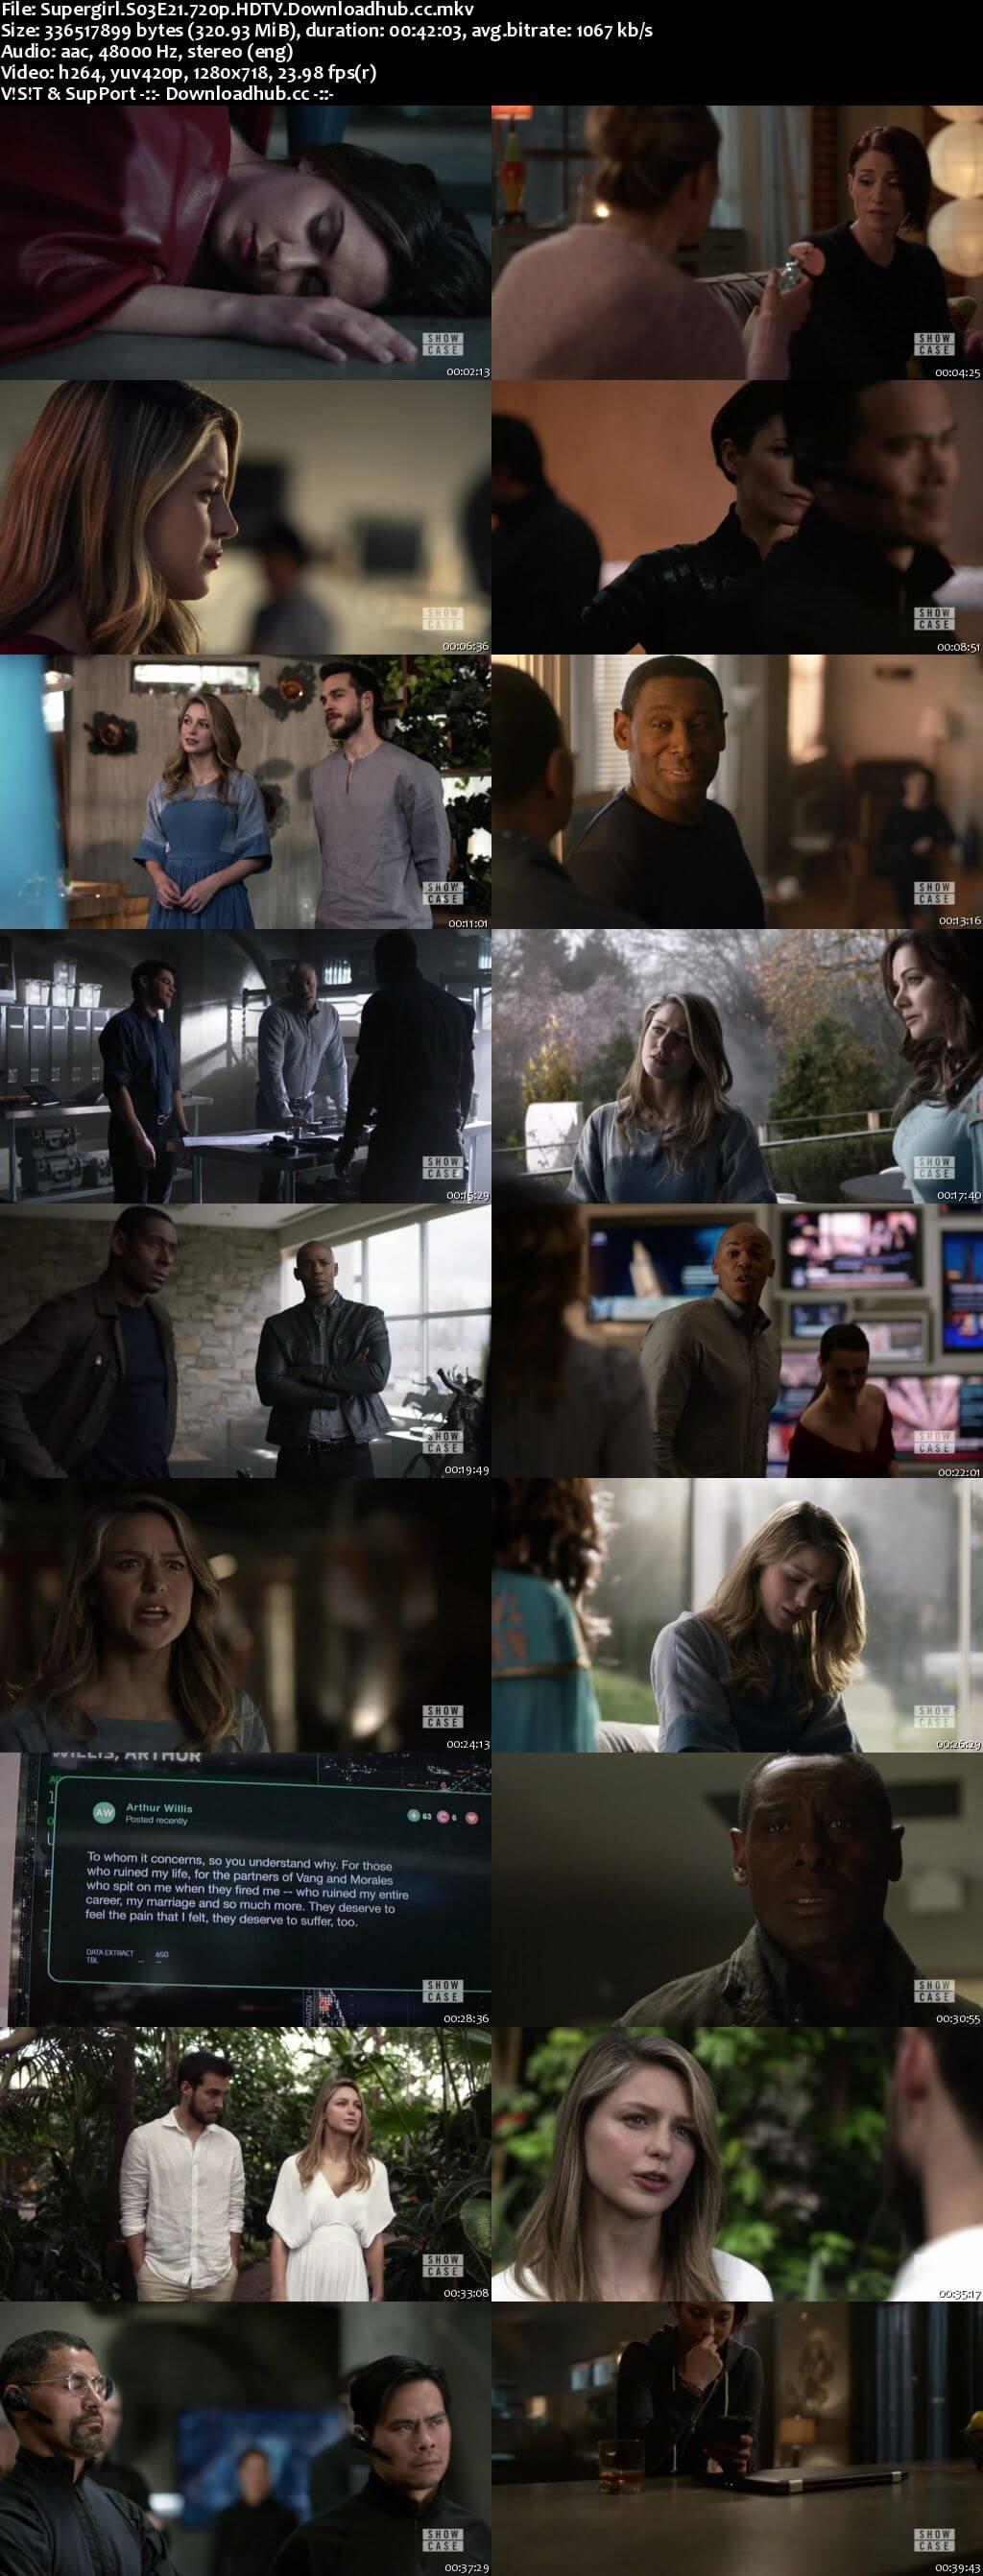 Supergirl S03E21 320MB HDTV 720p x264